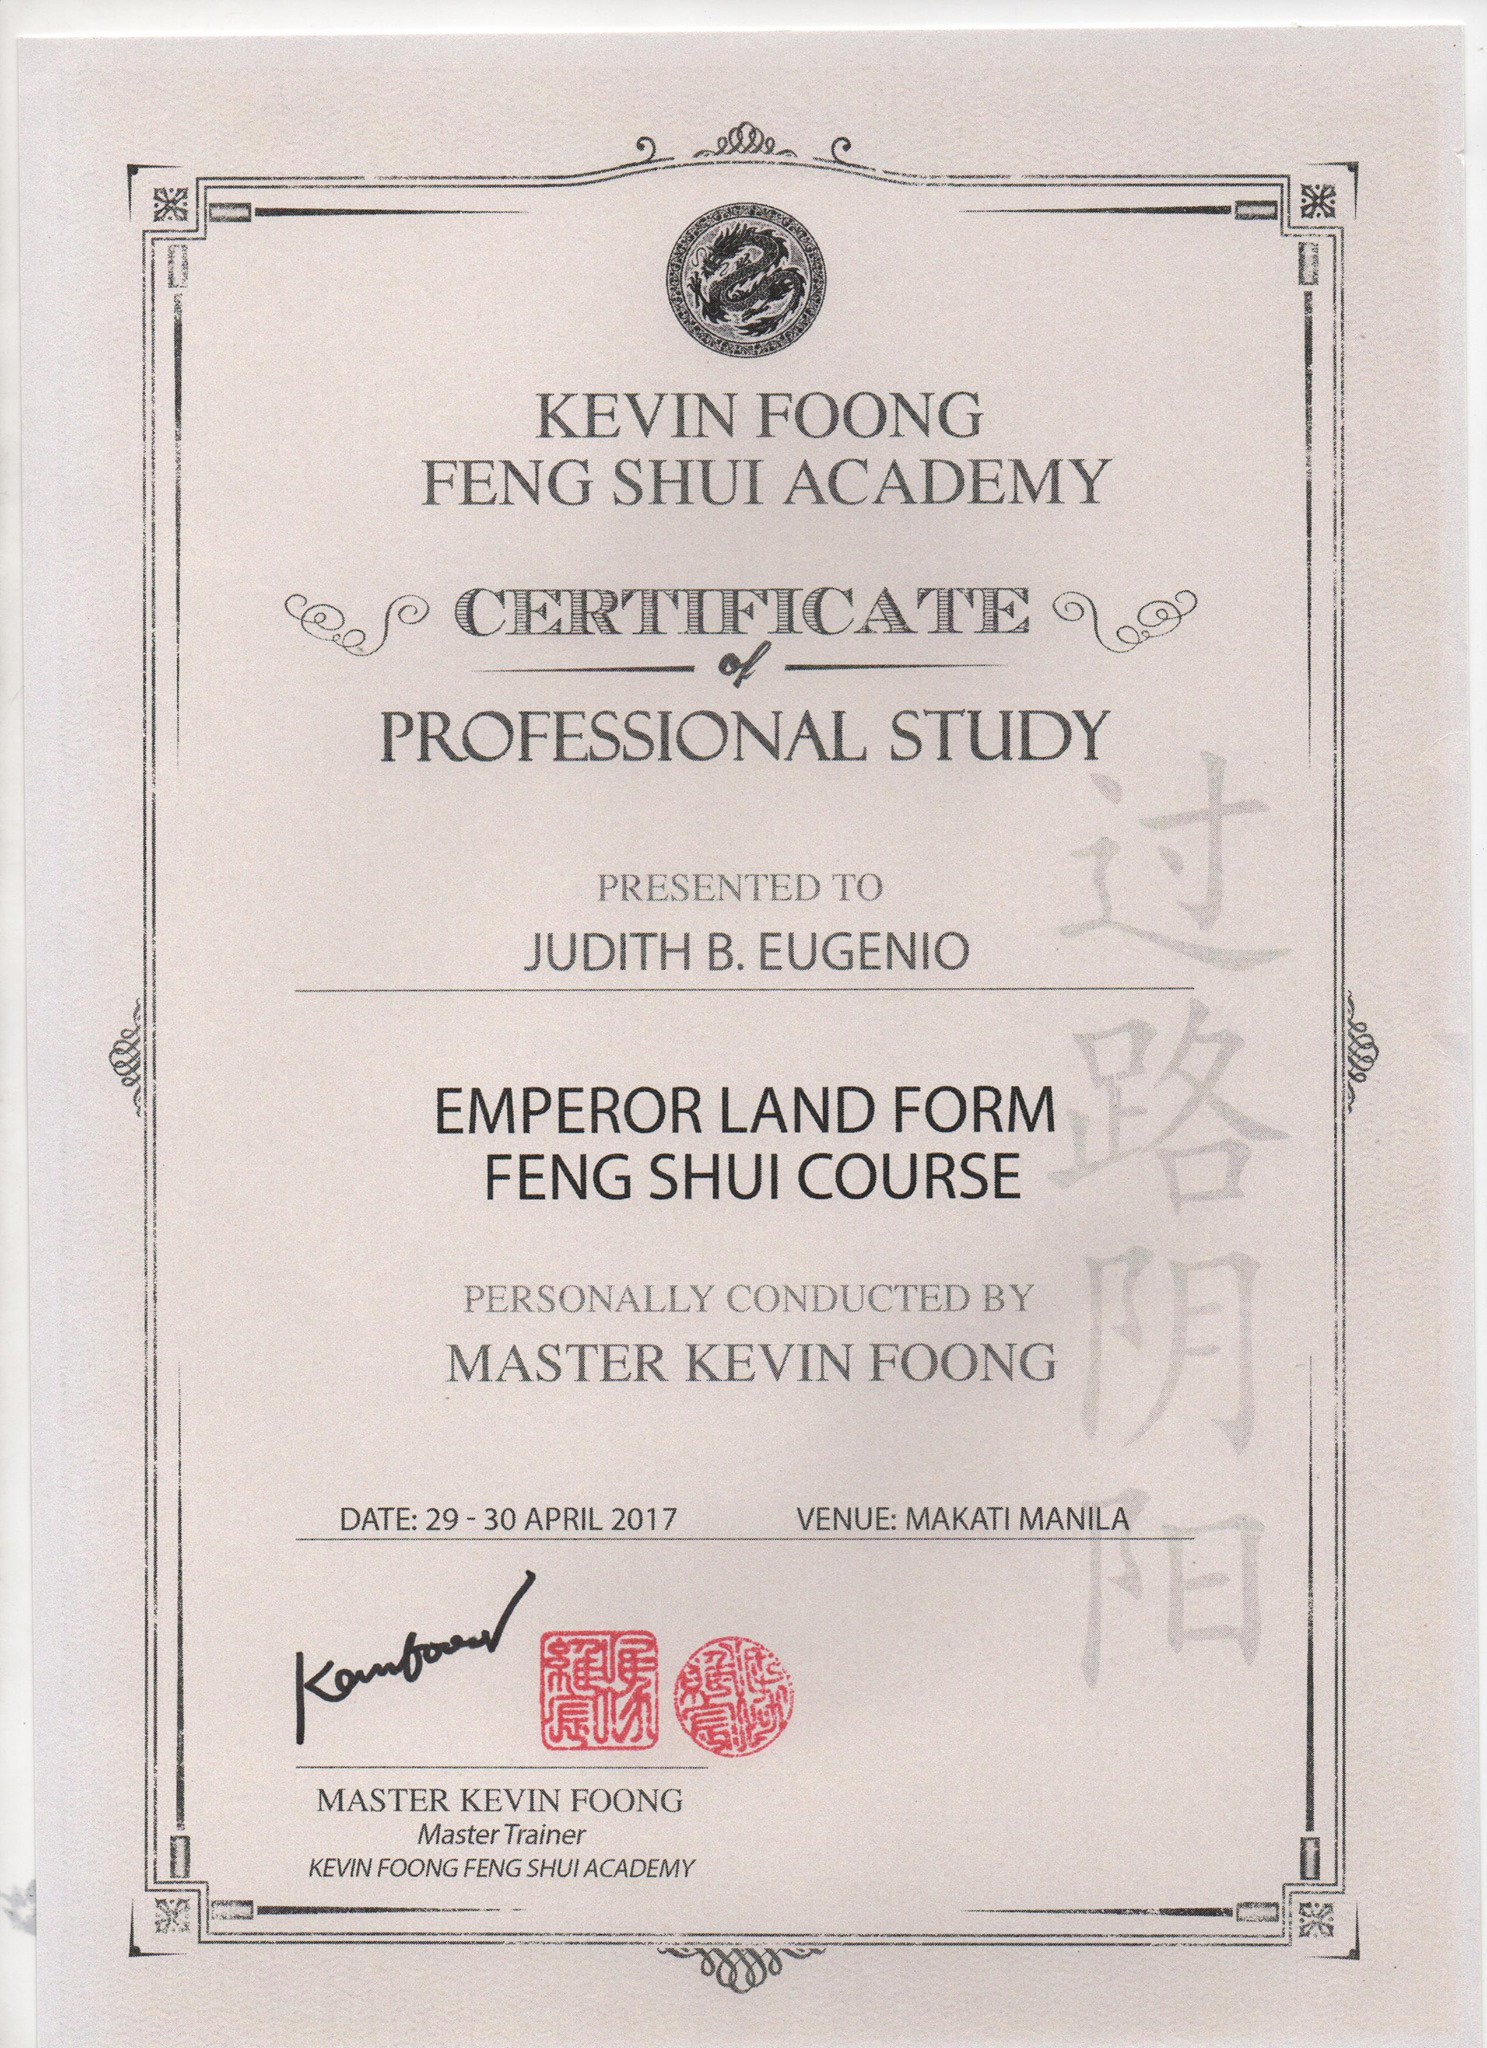 Emperor Land Form Feng Shui Course